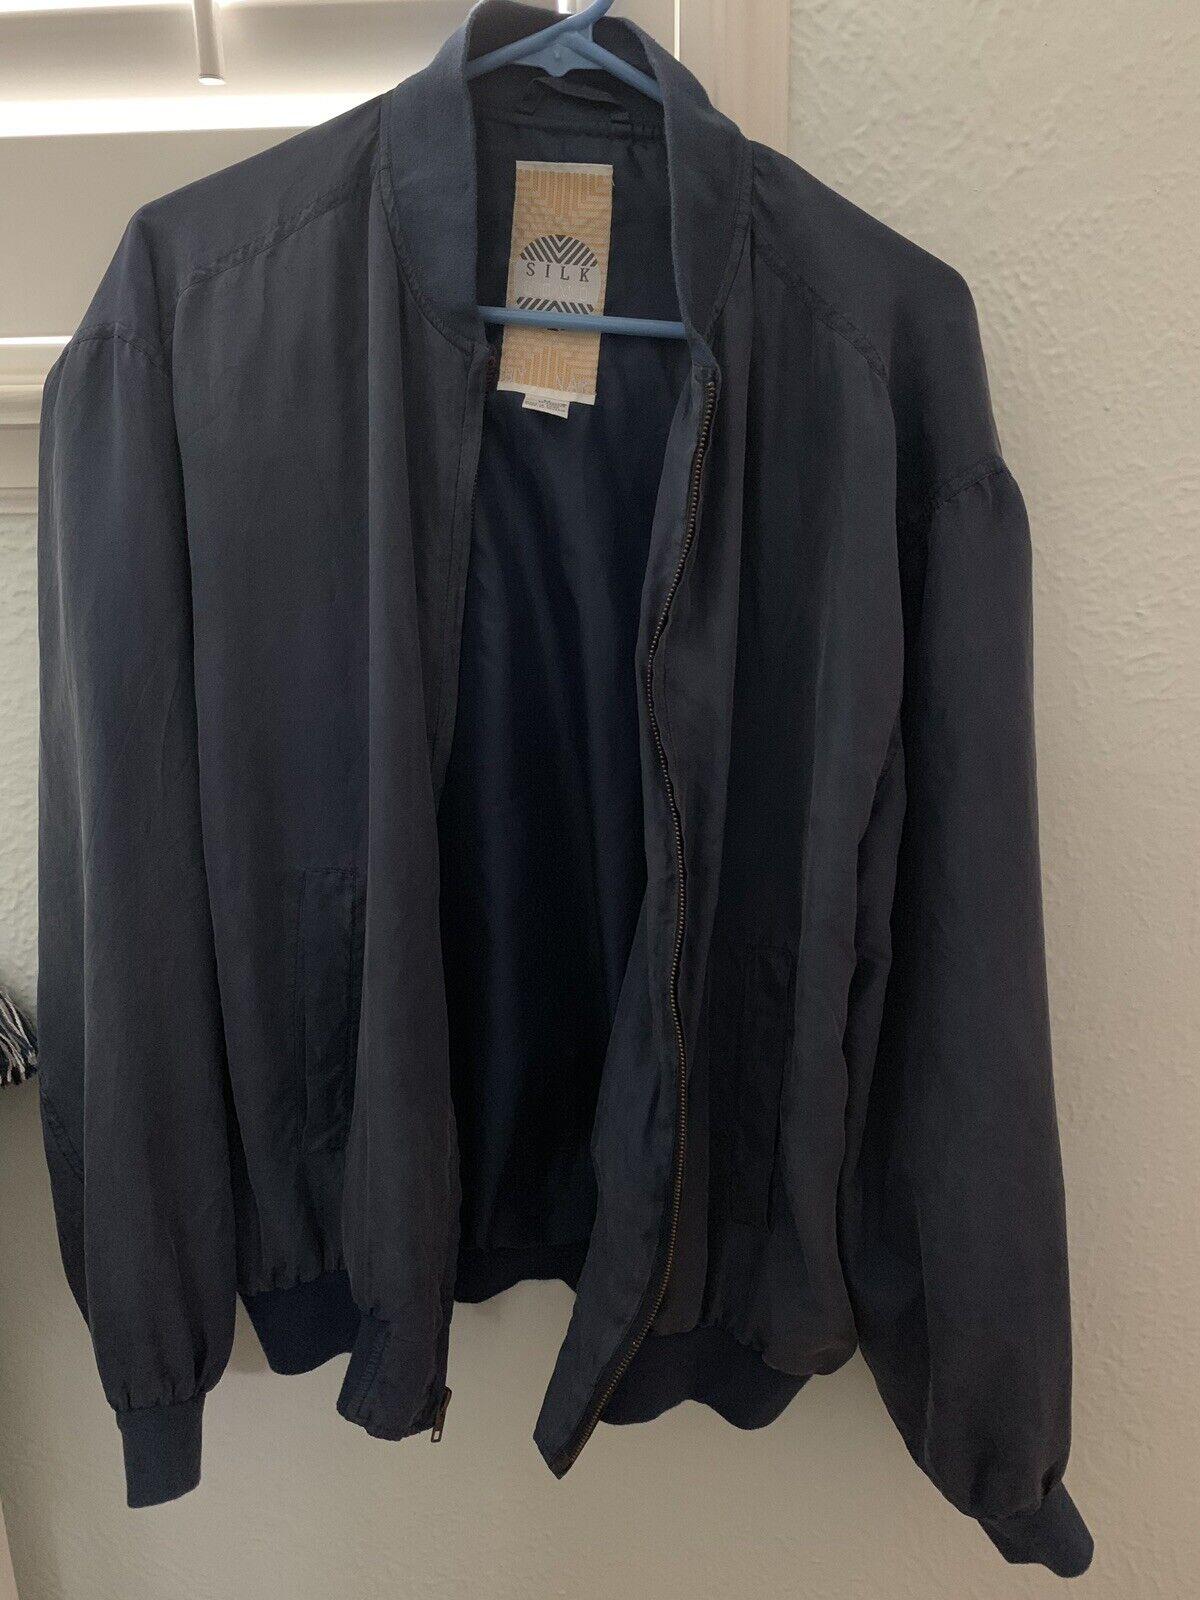 Silk UOMO By NAK Unisex Bomber Jacket Size M In N… - image 1